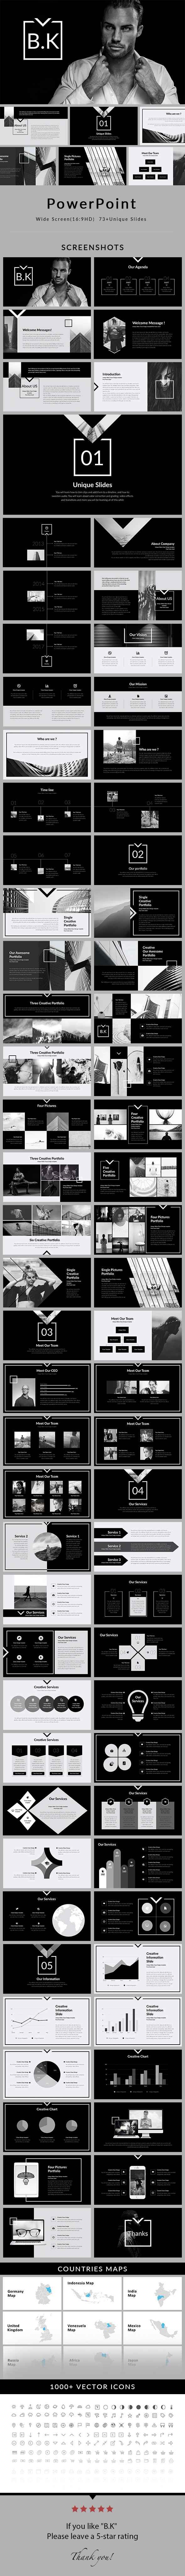 B.K - PowerPoint Presentation Template - Creative PowerPoint Templates